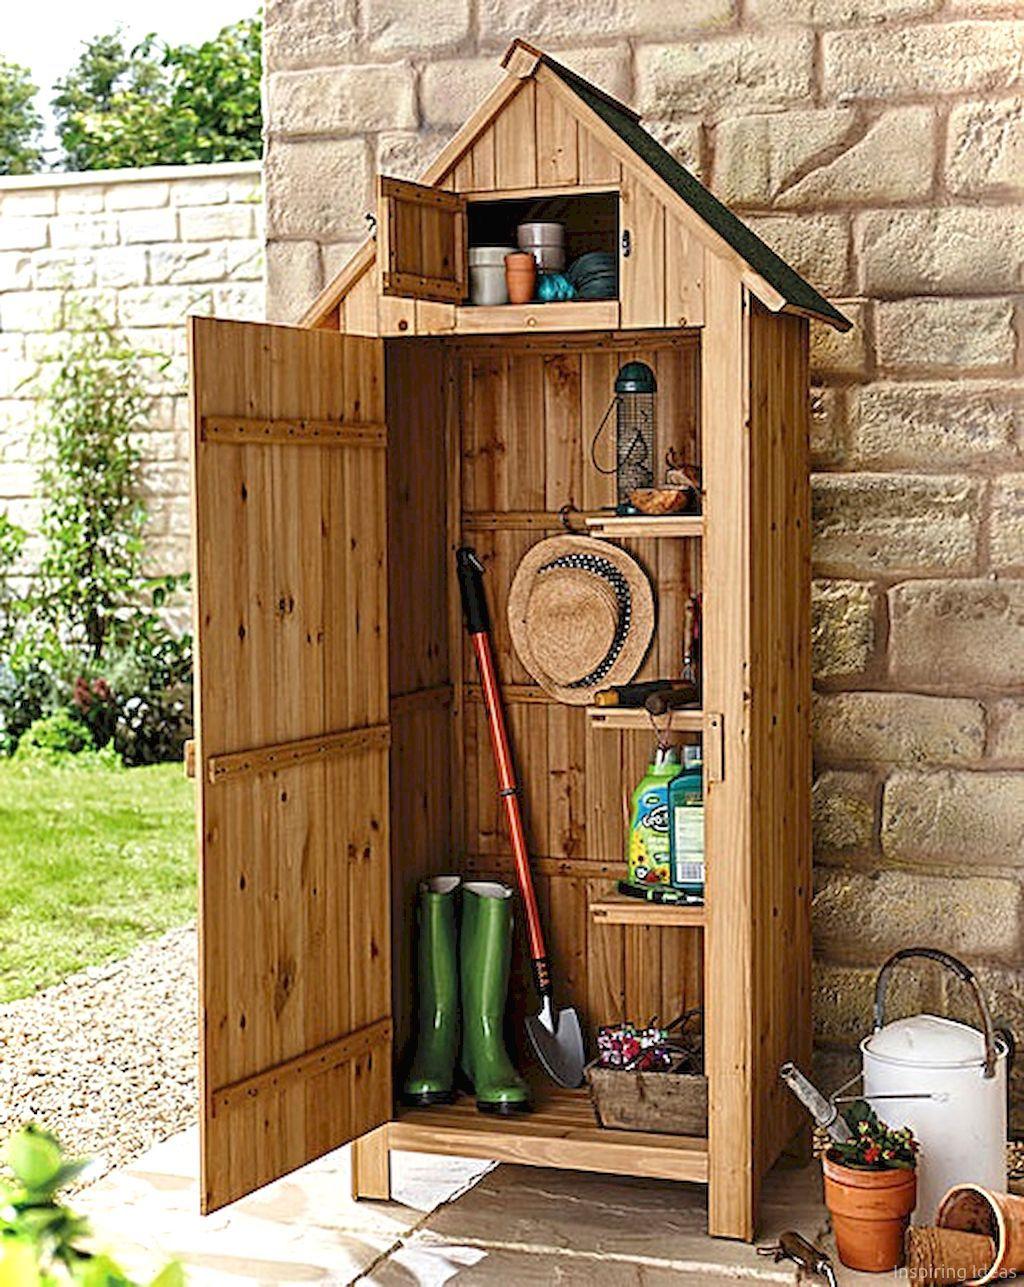 Adorable 45 Affordable Garden Shed Plans Ideas For You Https Lovelyving Com 2017 11 23 45 Affordable Garden S Garden Tool Shed Garden Tool Storage Tool Sheds